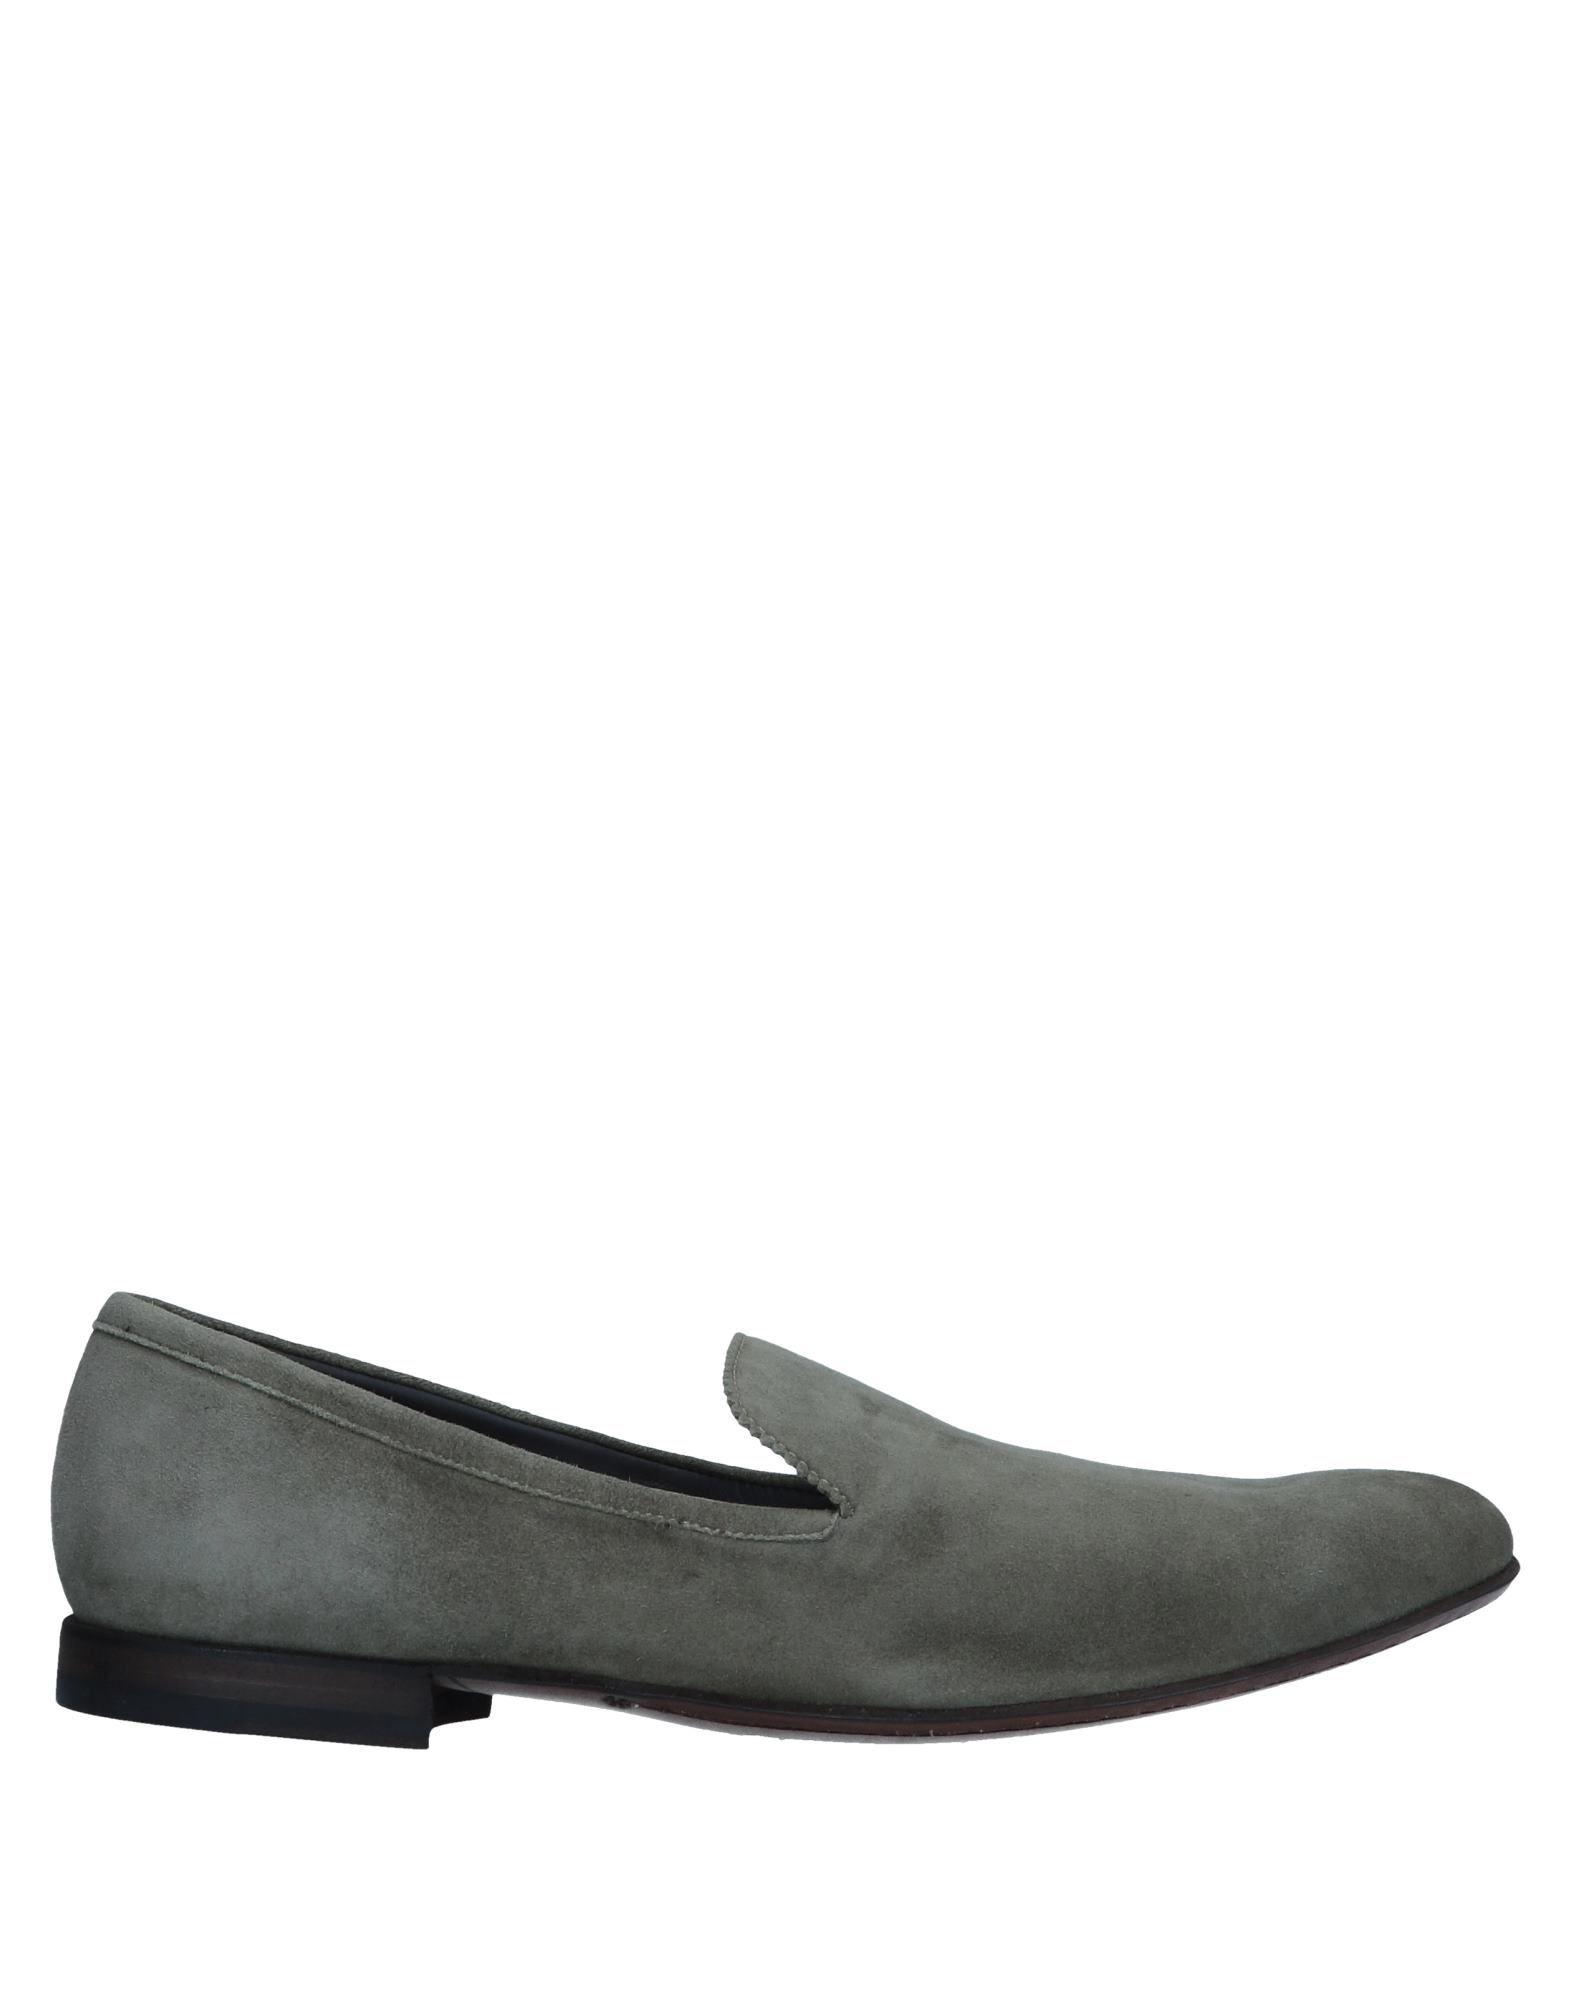 Alberto Guardiani Mokassins Herren  11557695IG Gute Qualität beliebte Schuhe